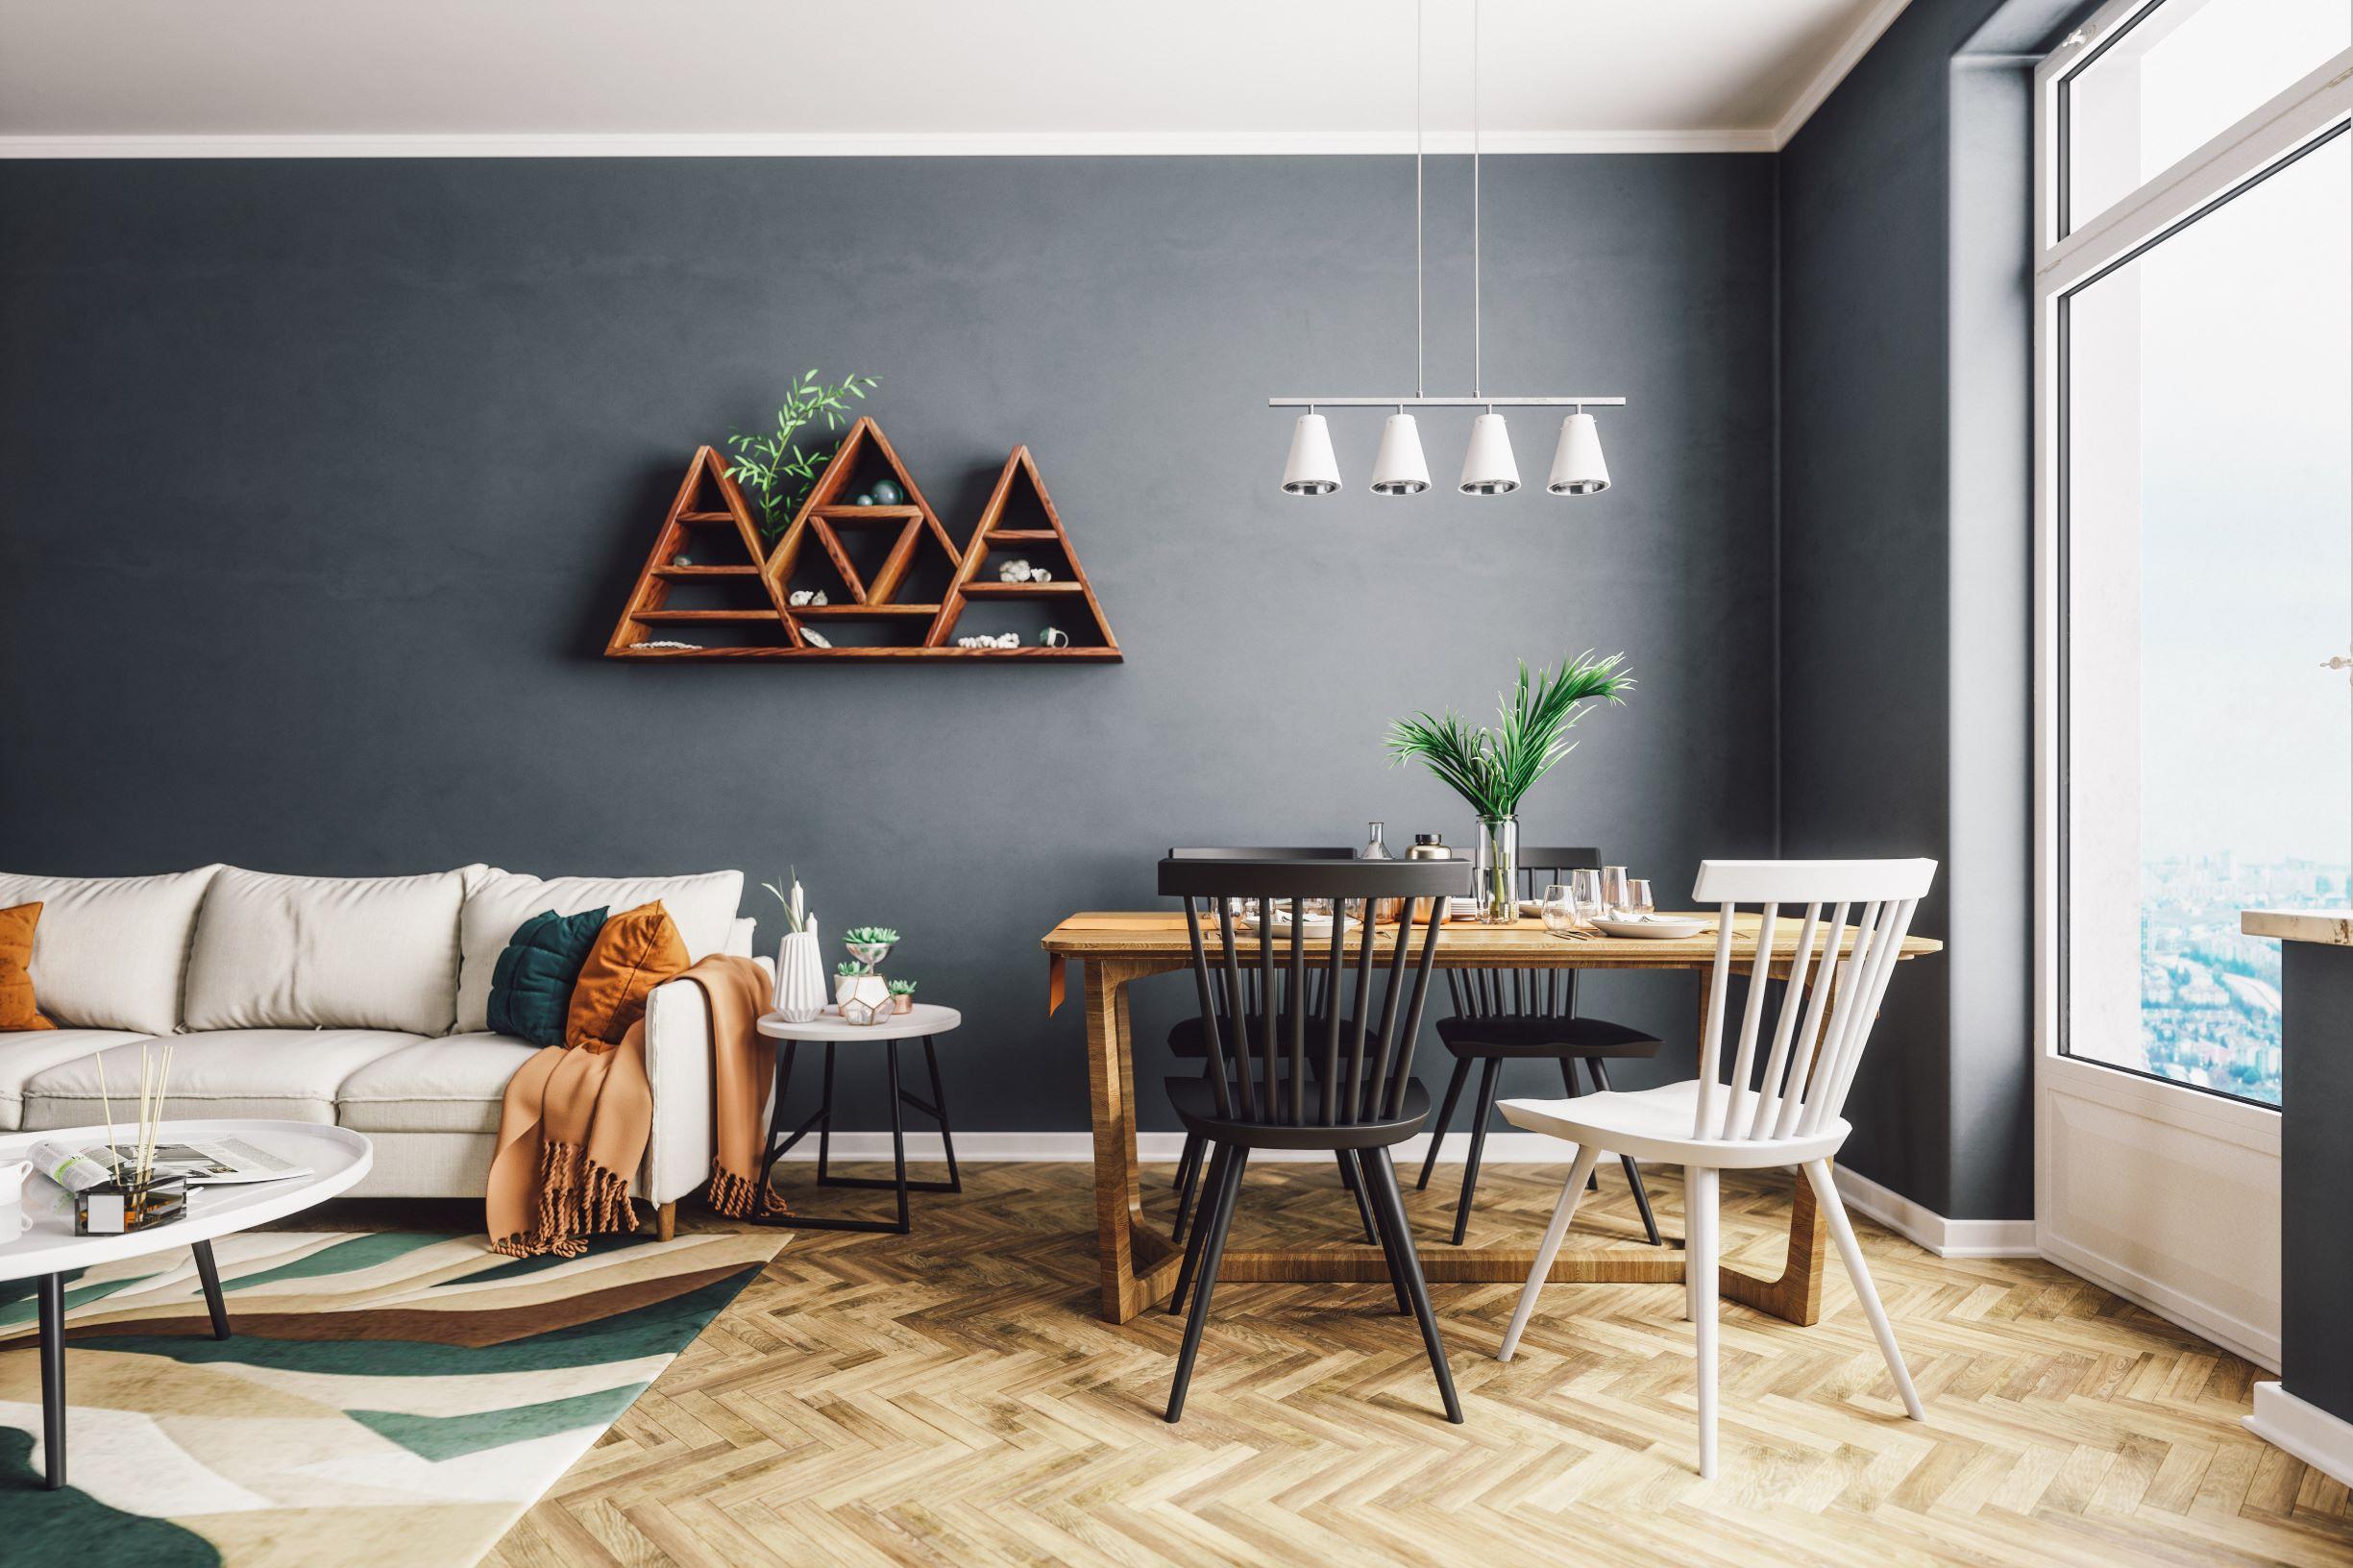 Top online home decor companies 2020